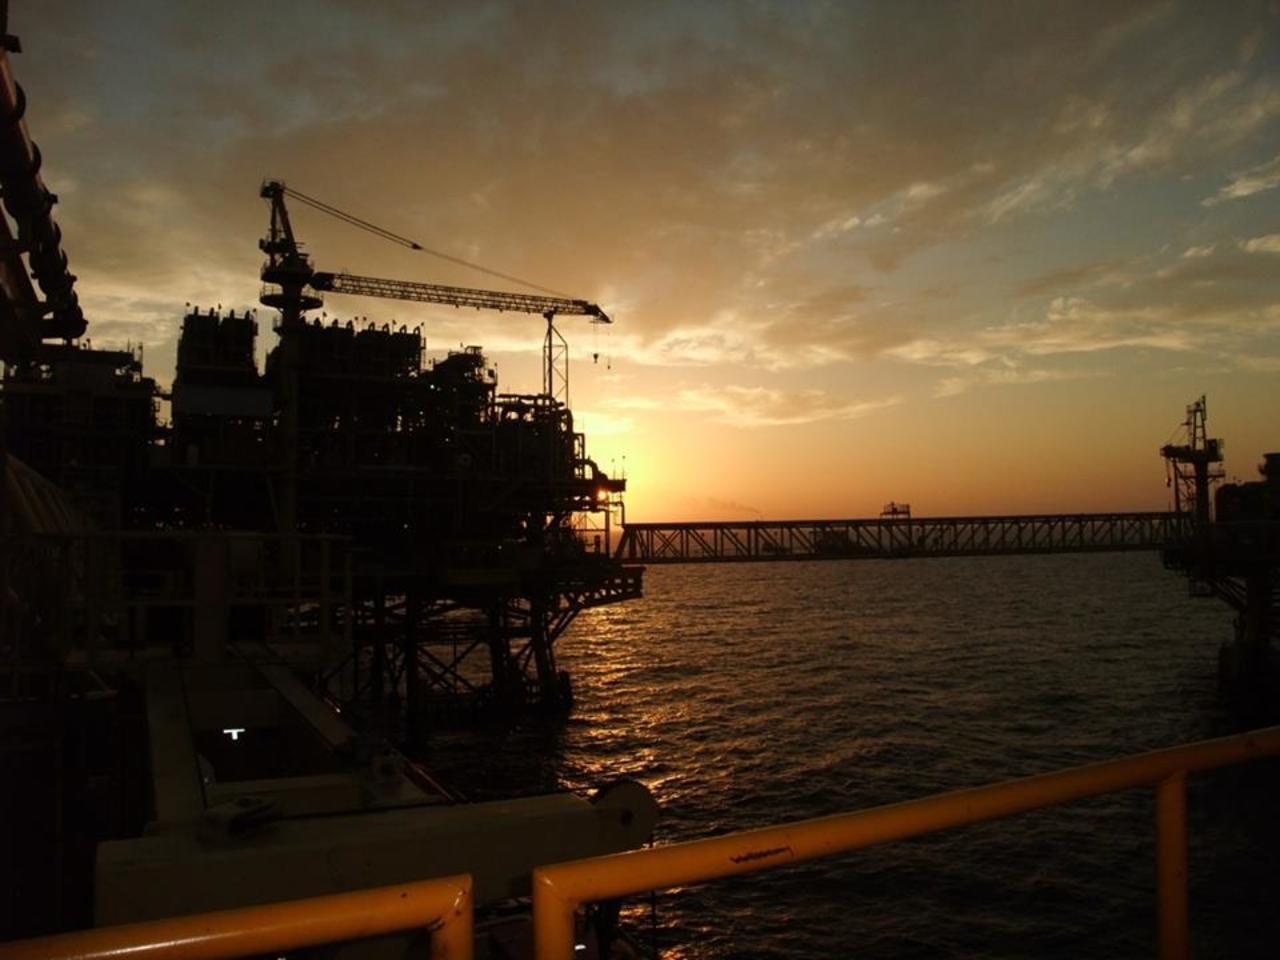 16 campos prioritarios de Pemex producirán 300,000 barriles diarios